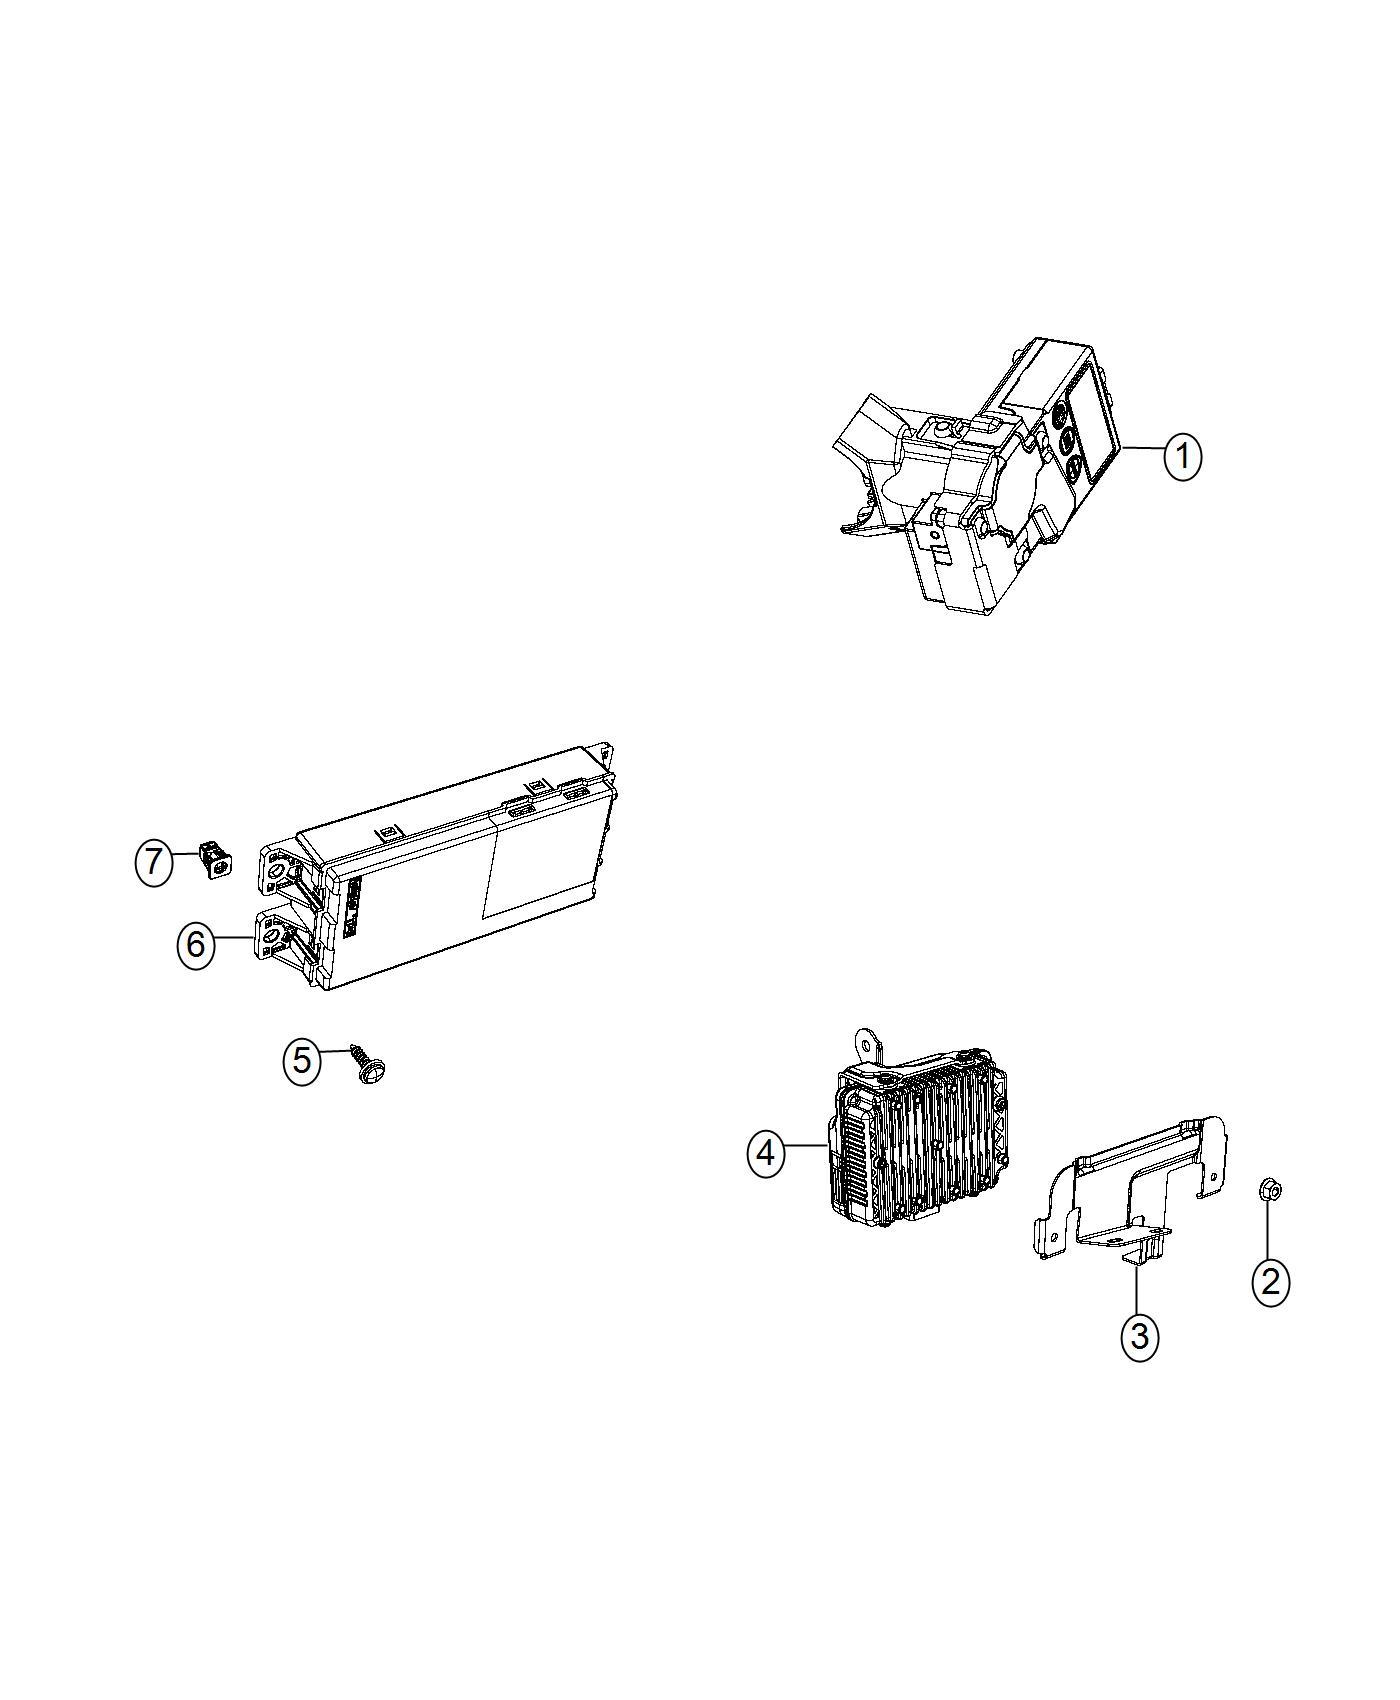 Jeep Renegade Module Telematics Instrument Panel Parts